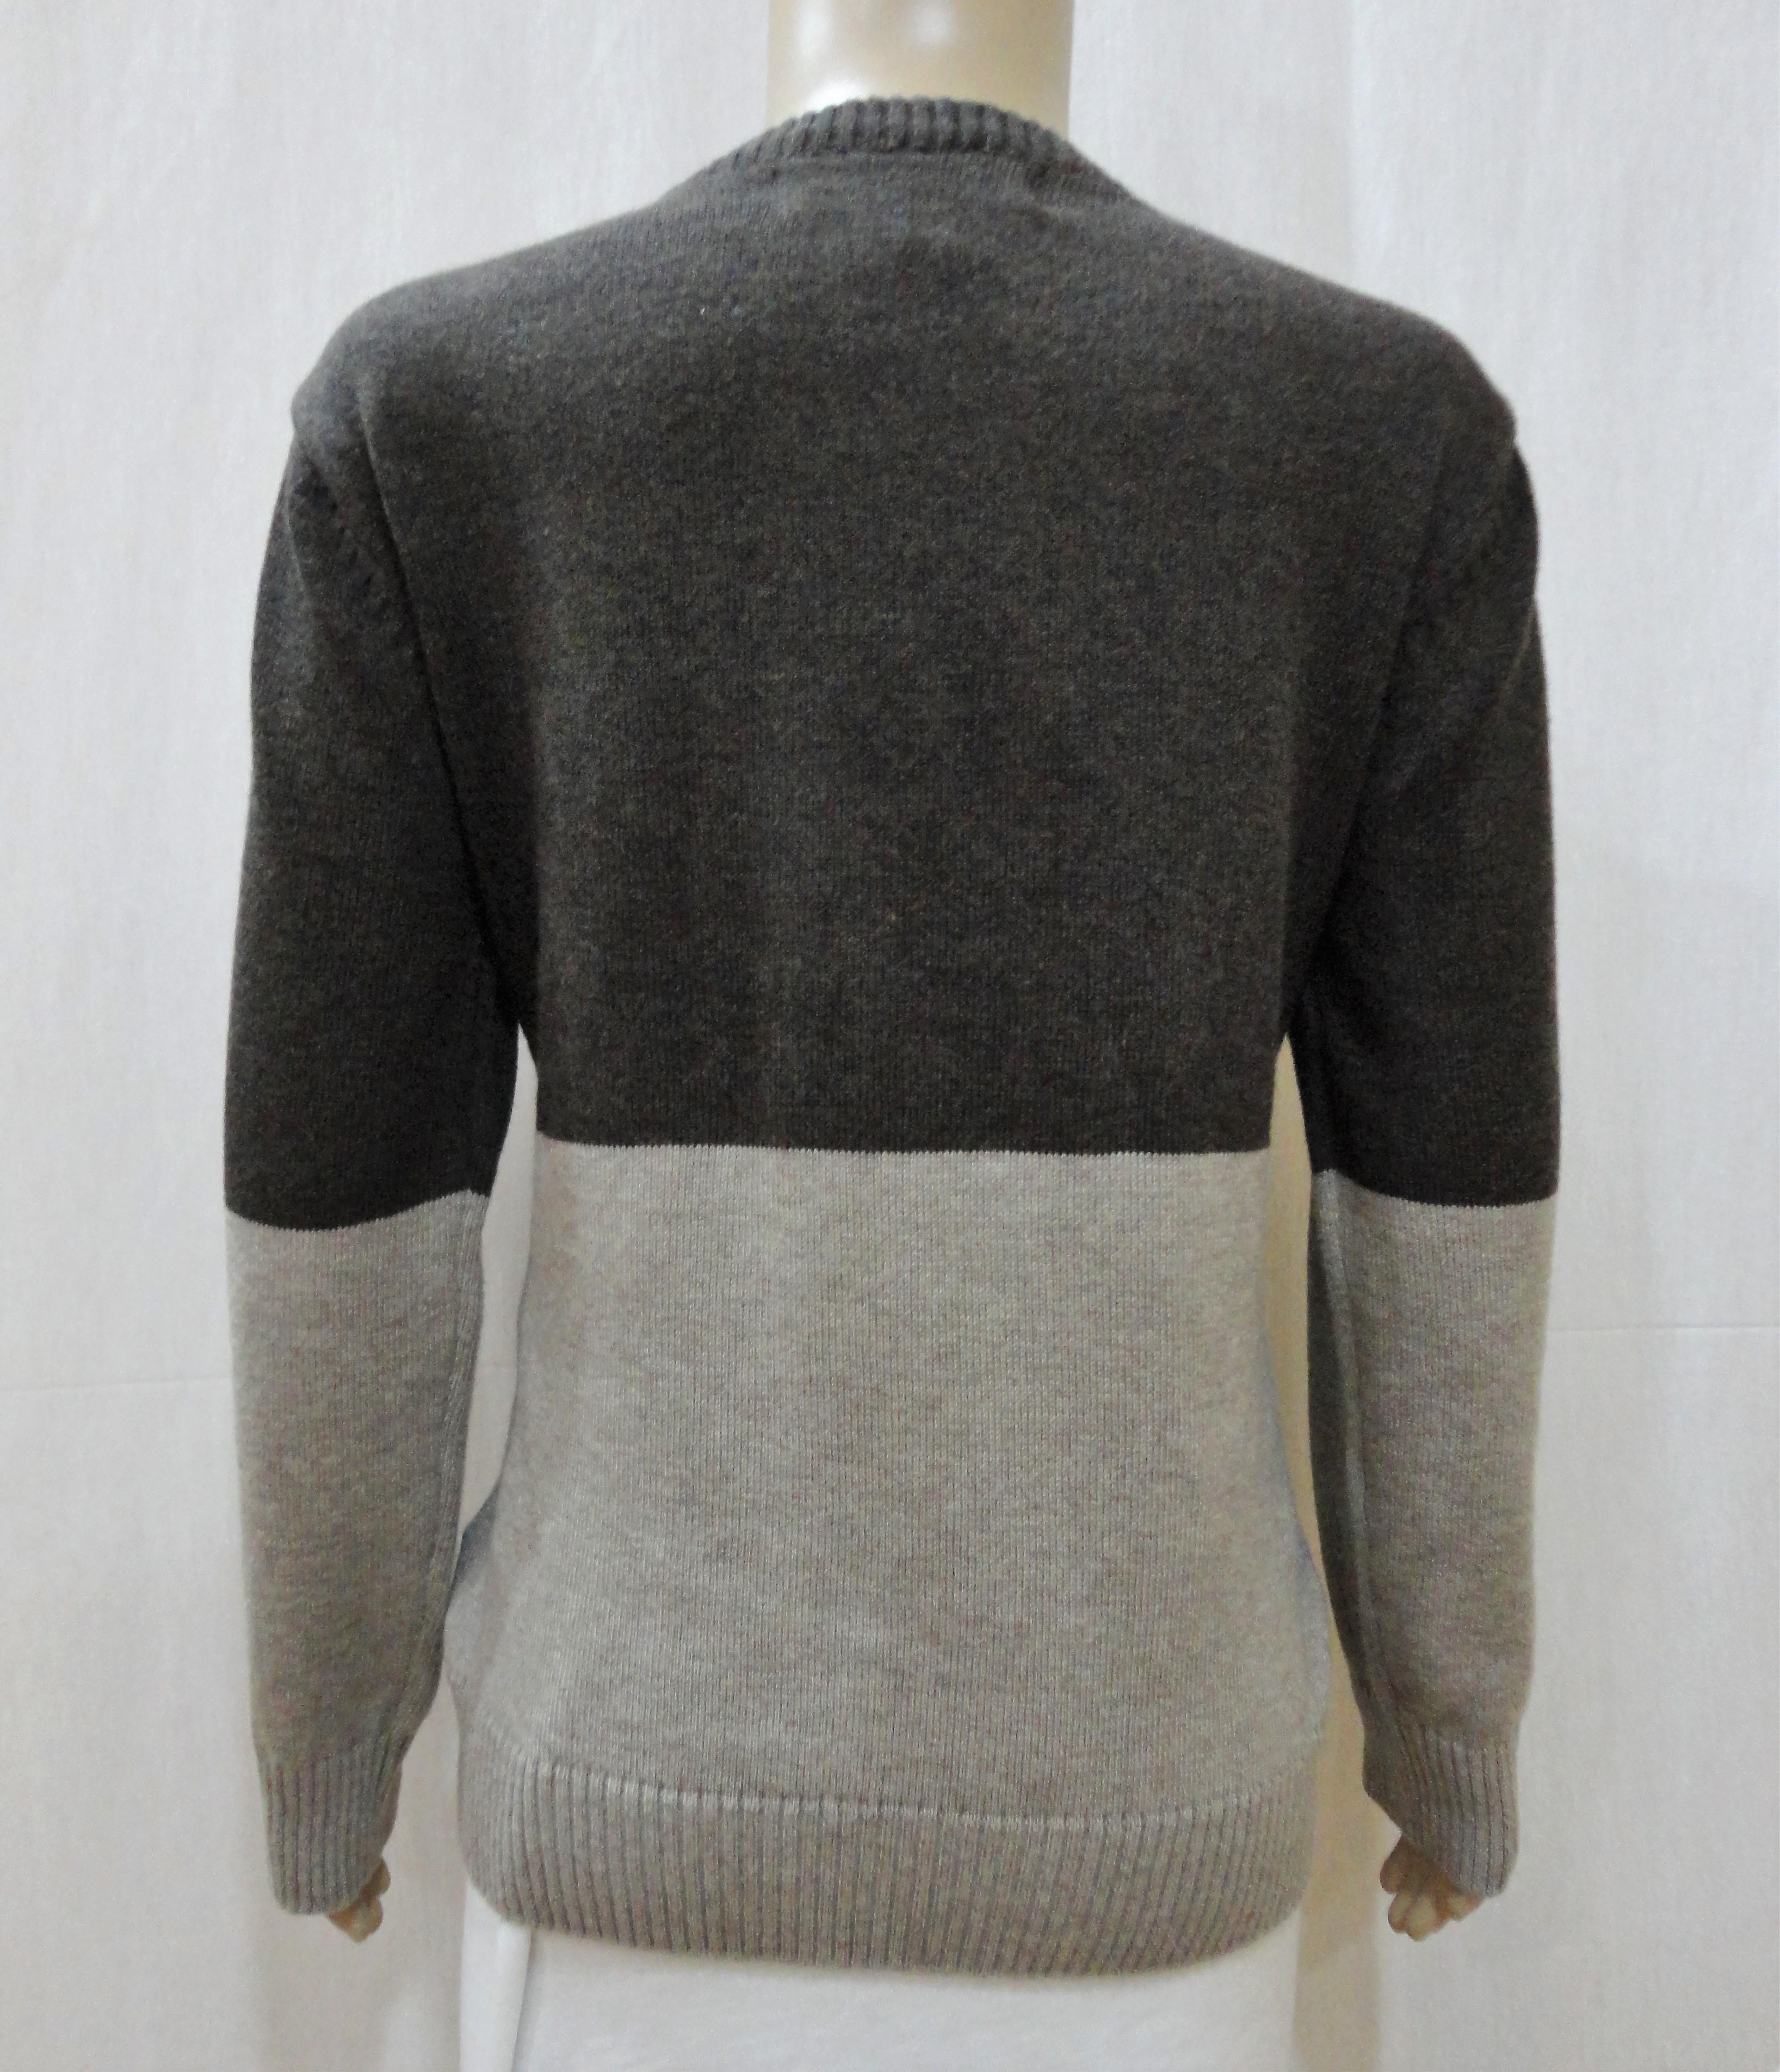 Baby Boy Intarsia Sweater